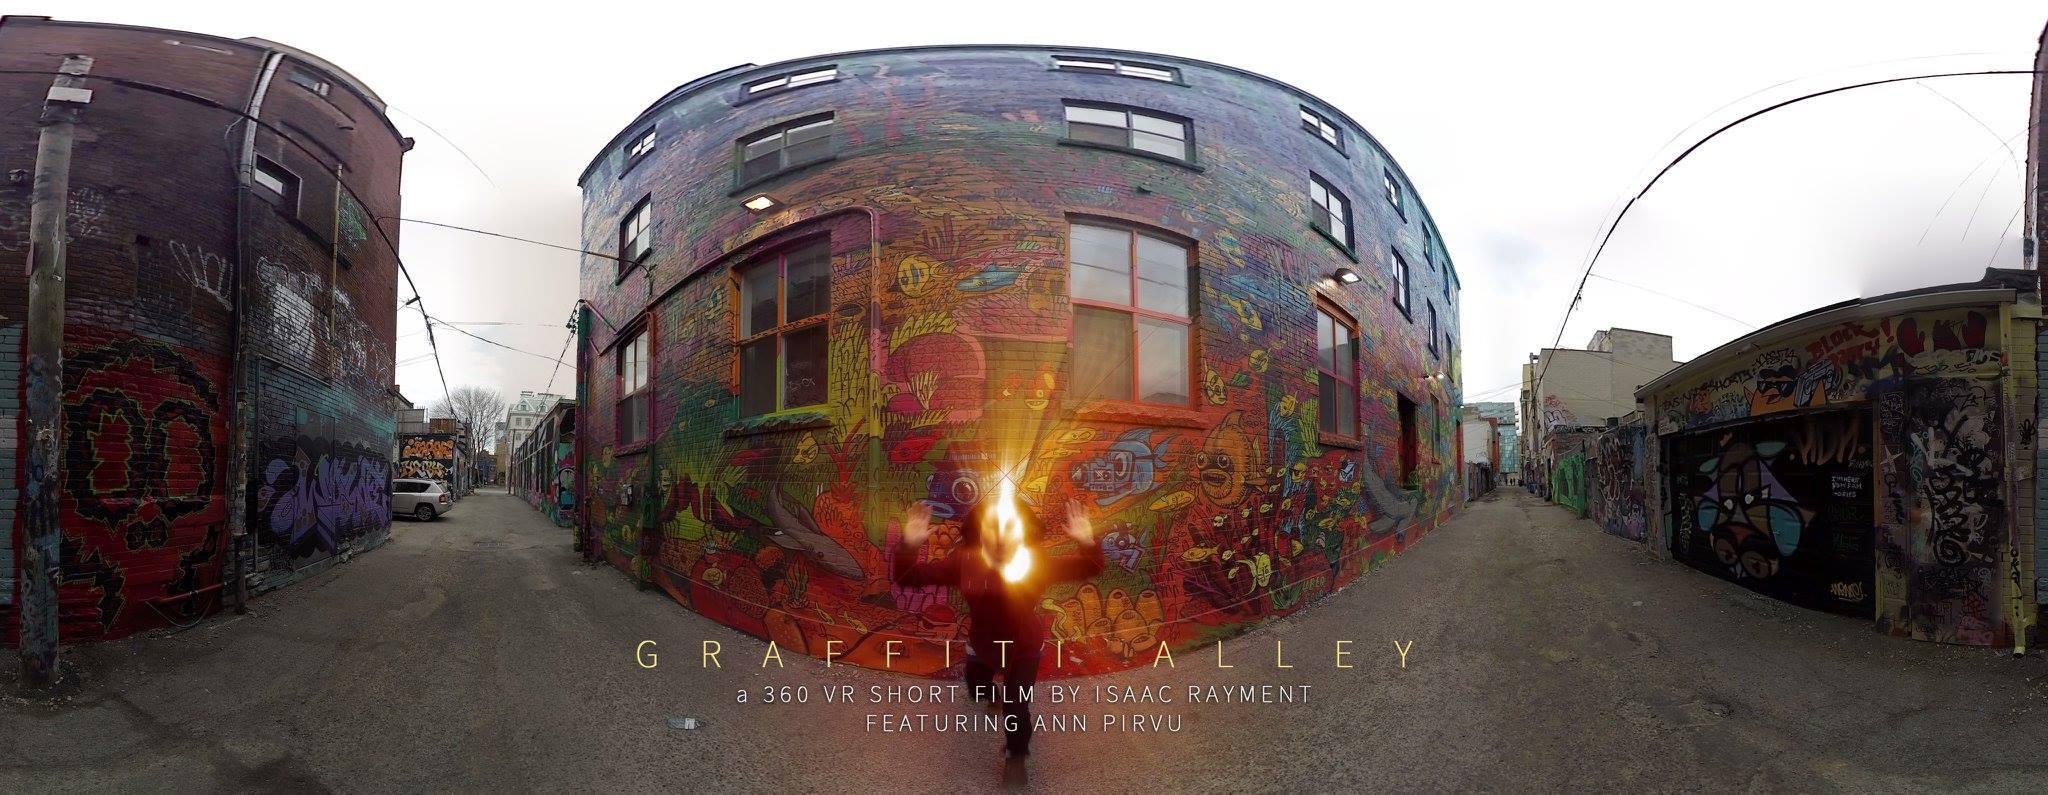 Graffiti Alley Equirectangular